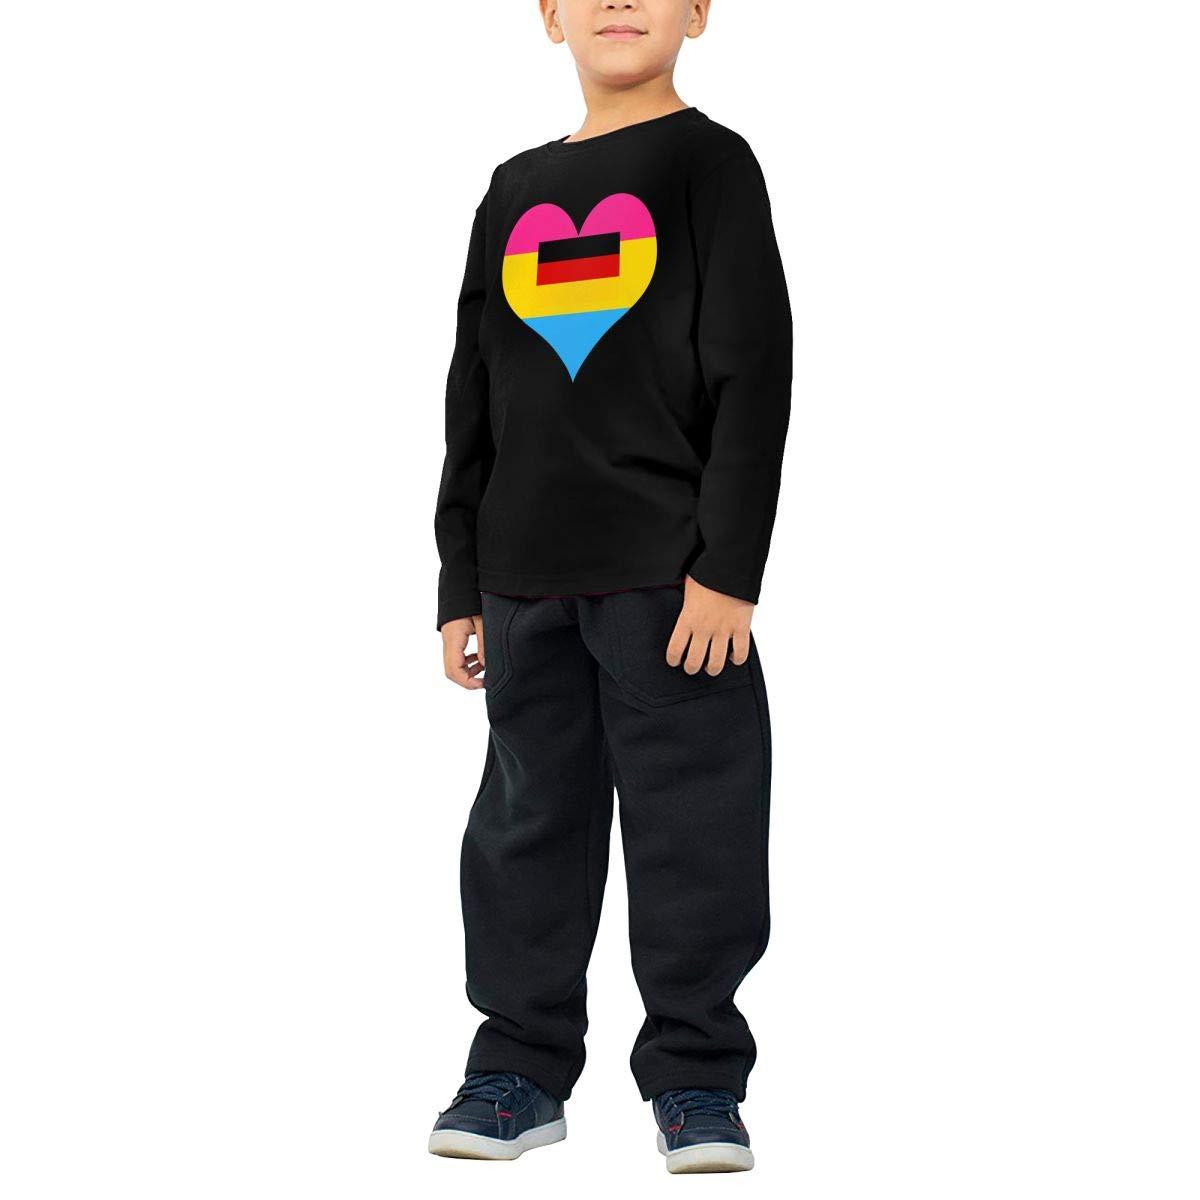 CERTONGCXTS Baby Boys Kids Pansexual Heart German Flag ComfortSoft Long Sleeve Tee